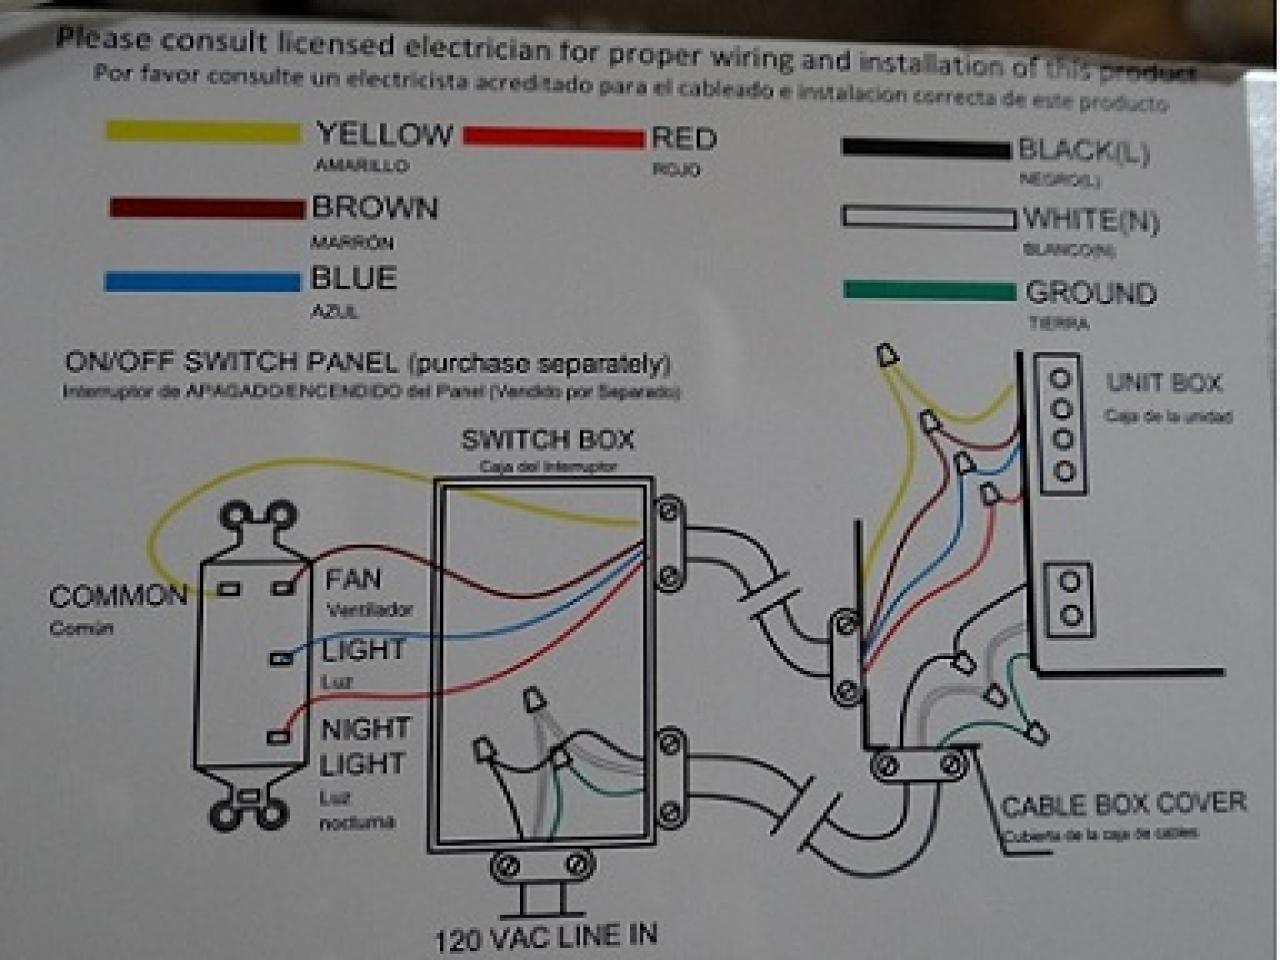 Hampton Bay Altura Ceiling Fan Wiring Diagram | Wiring Diagram - Hampton Bay Ceiling Fan Wiring Diagram